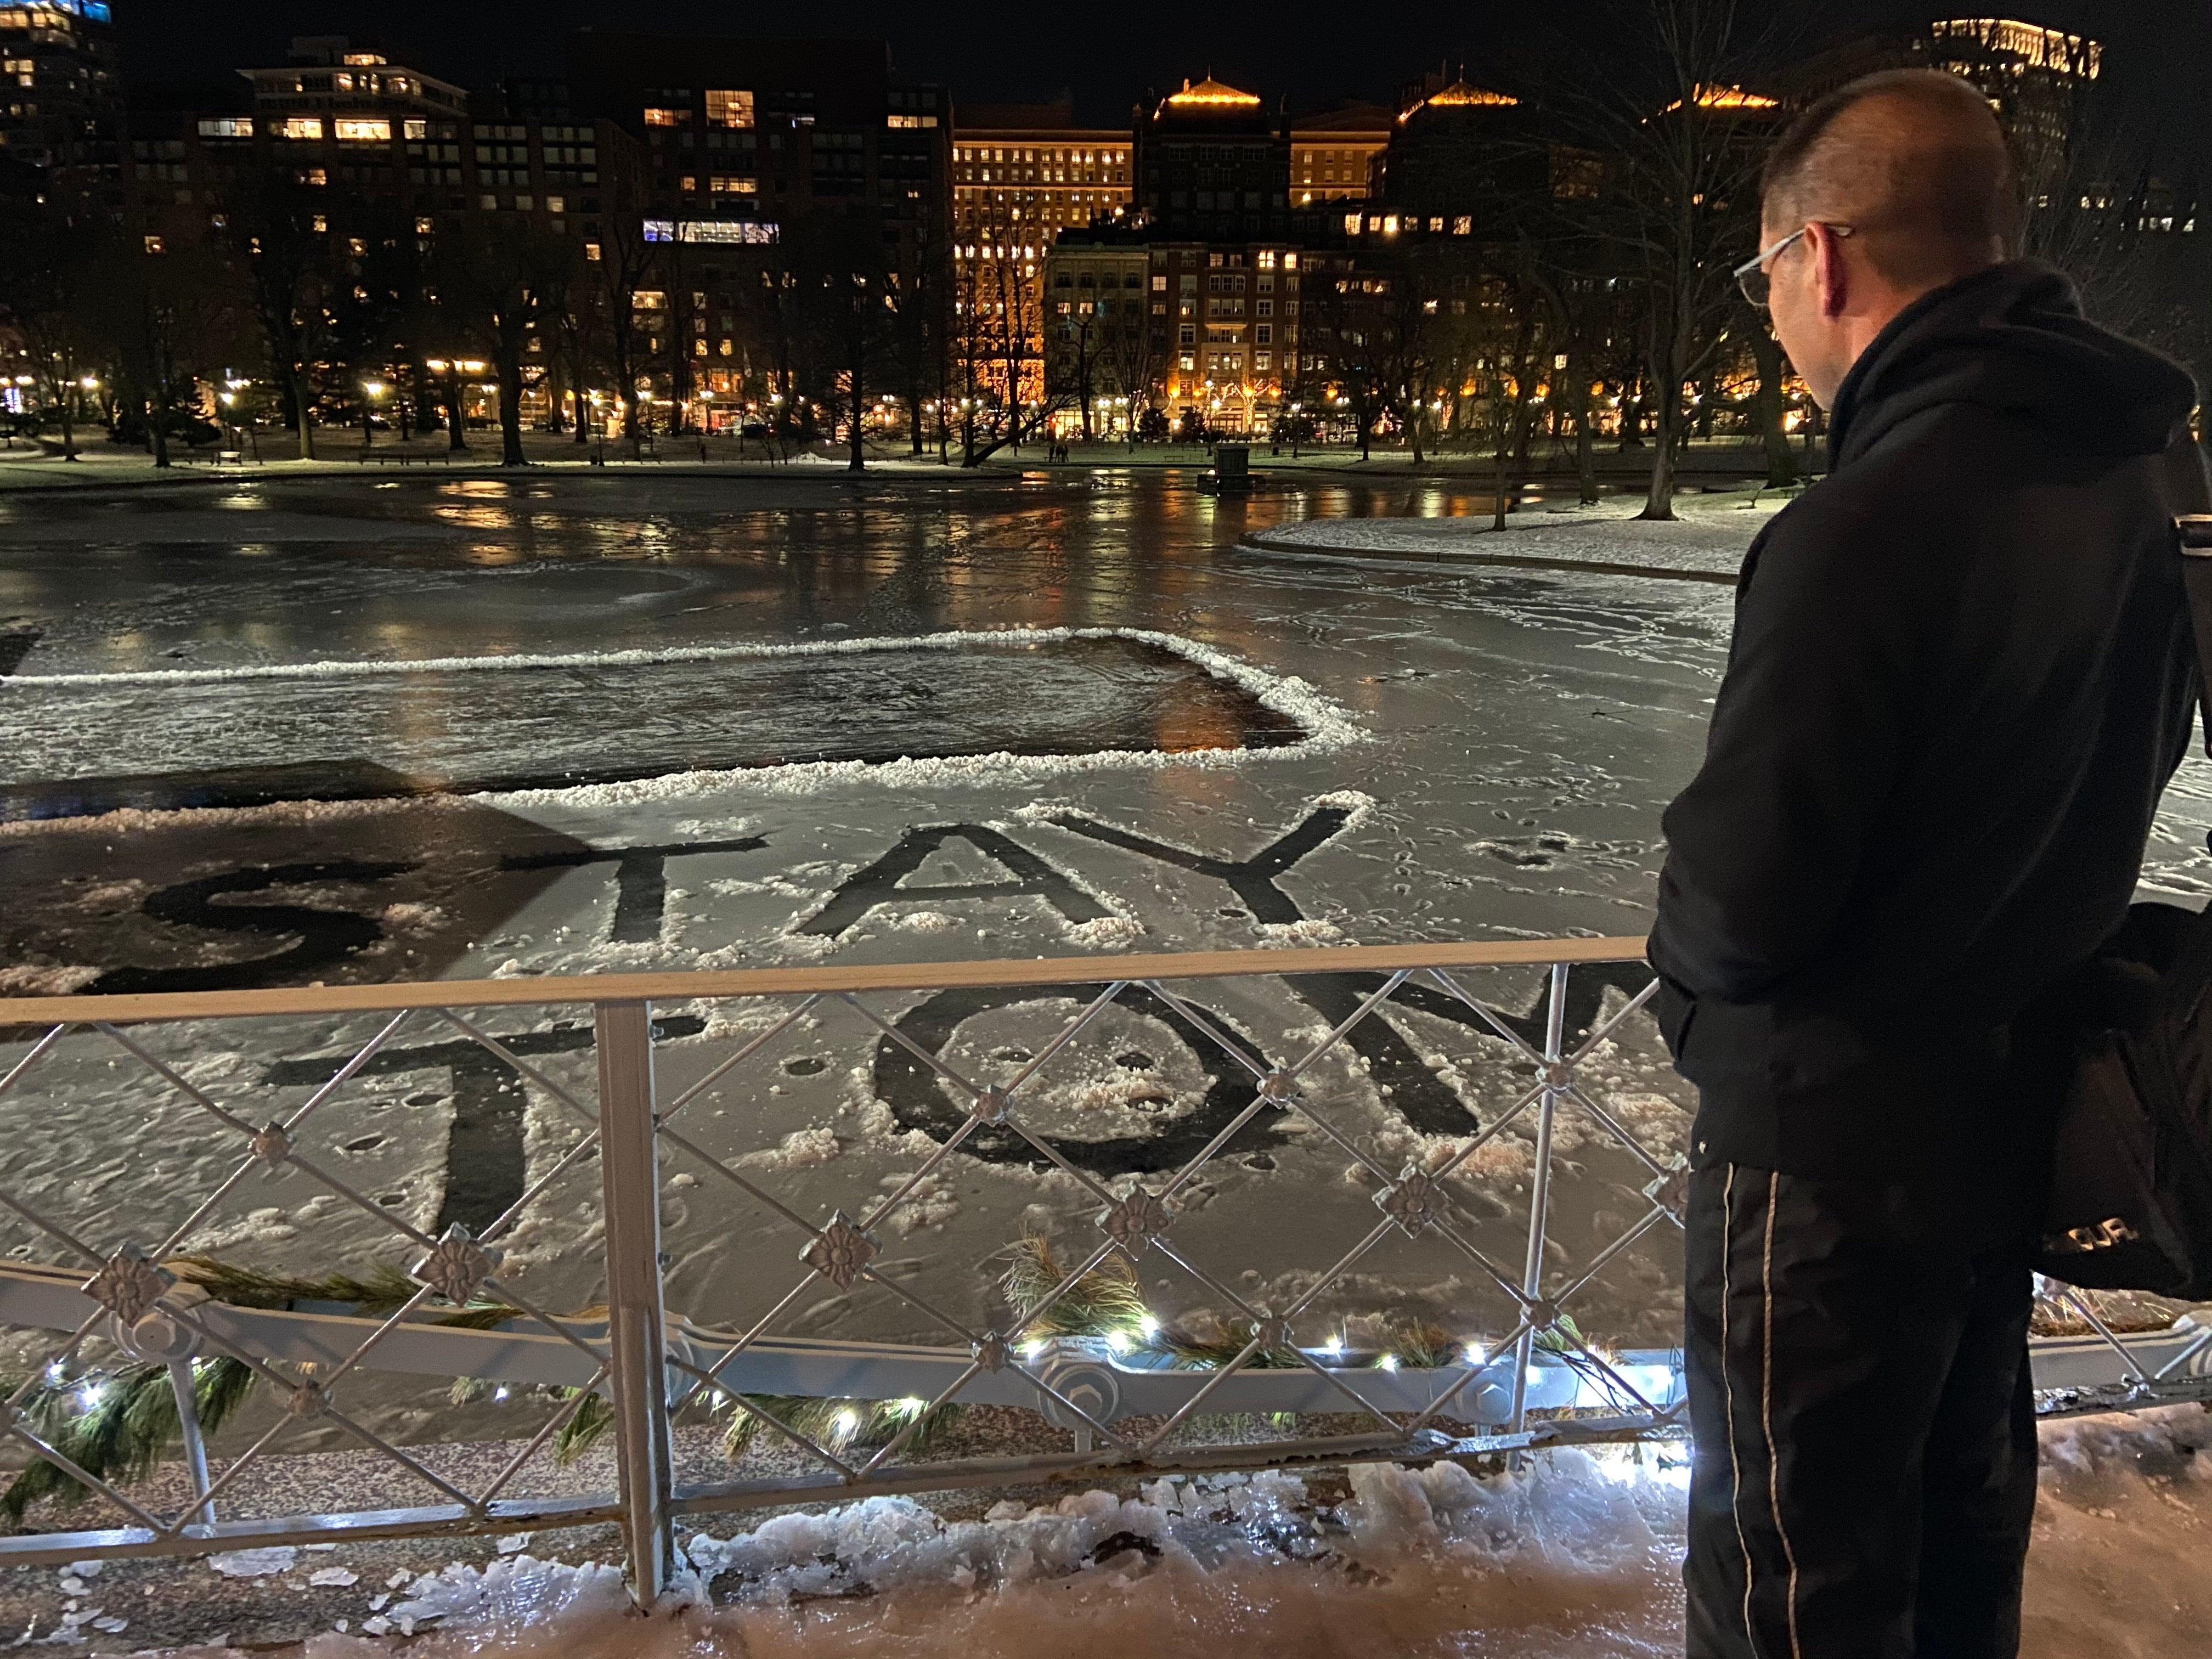 Stay Tom George Li Photo Boston Public Garden